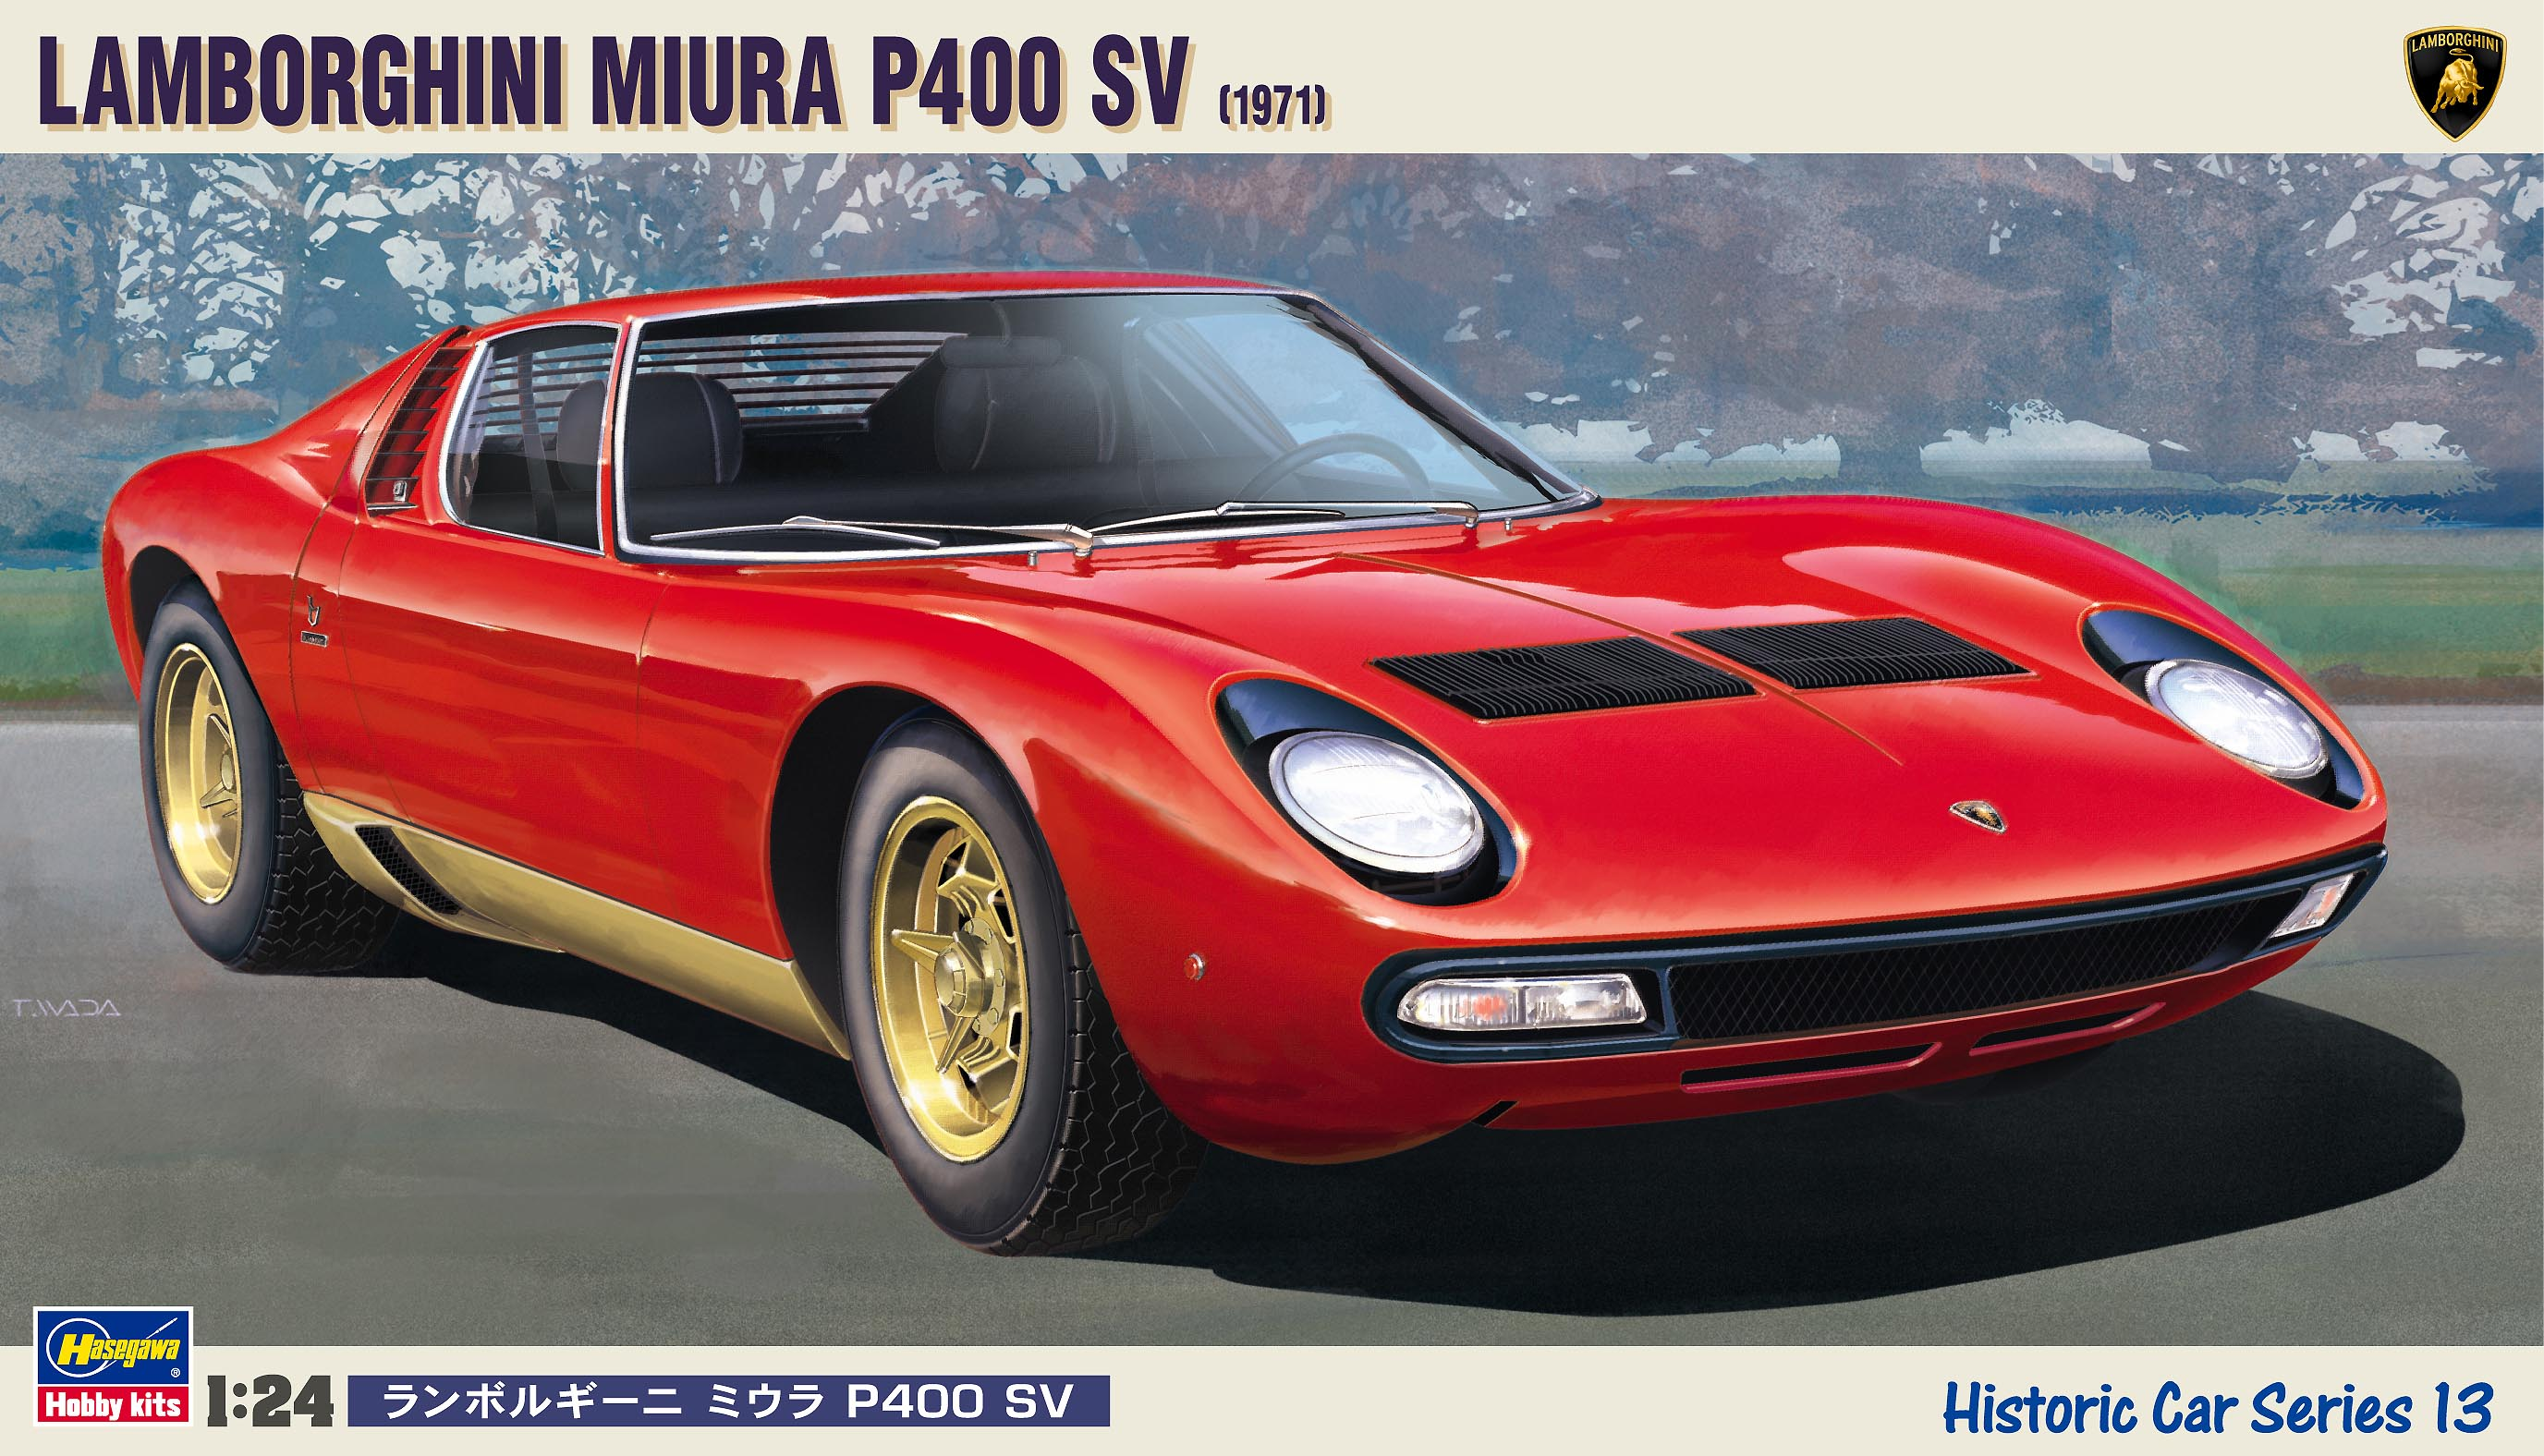 Hasegawa Lamborghini Miura Sv